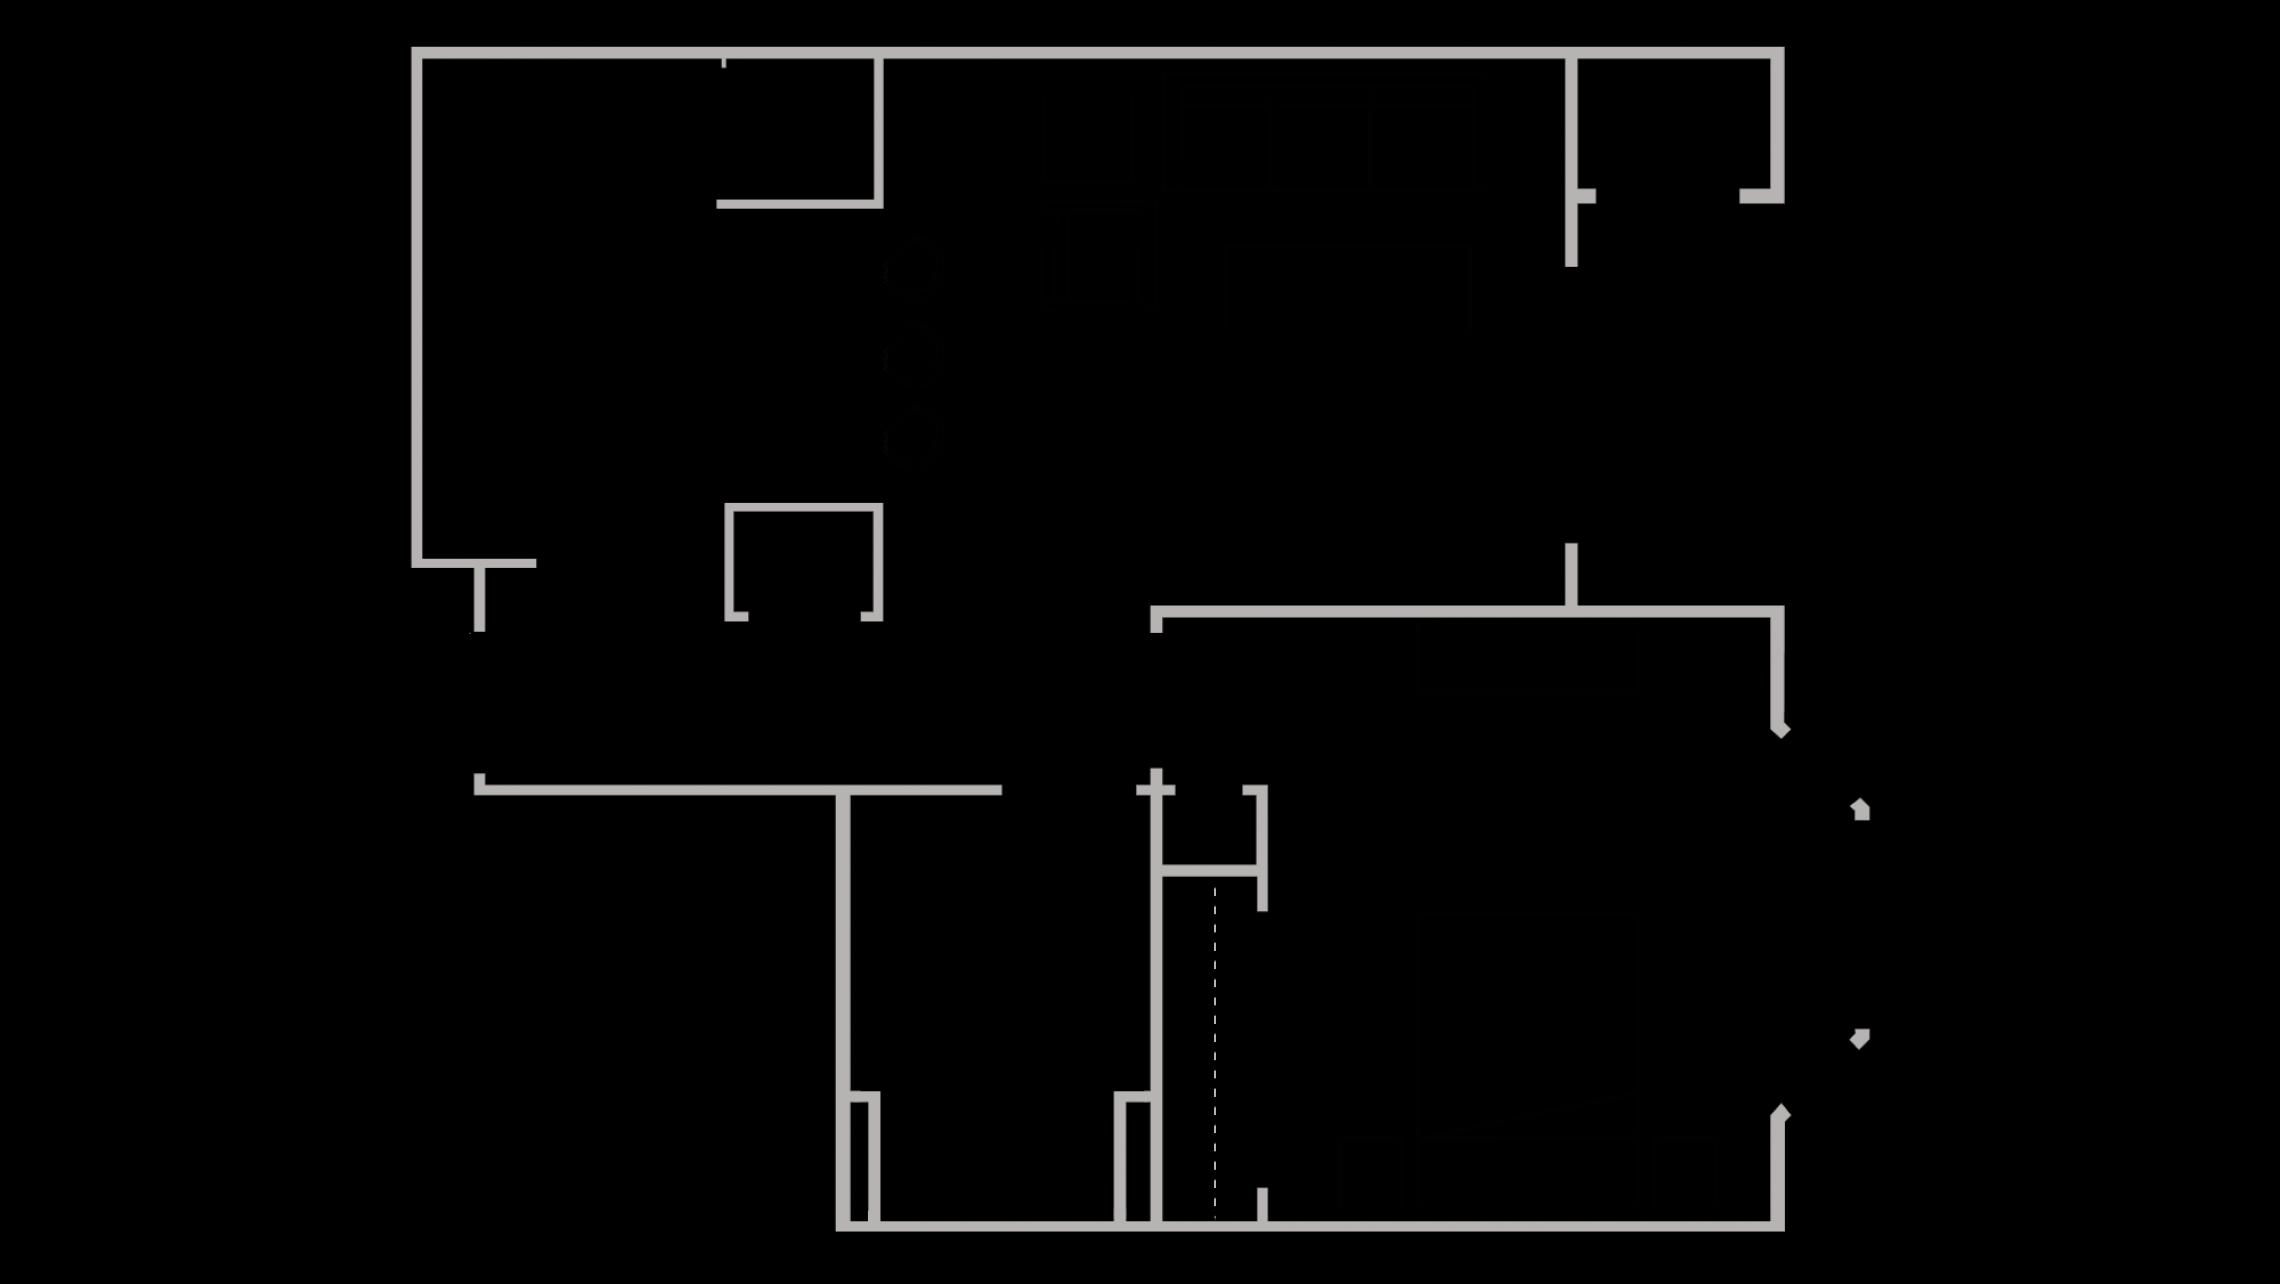 ULI City Place 210 - One Bedroom, One Bathroom